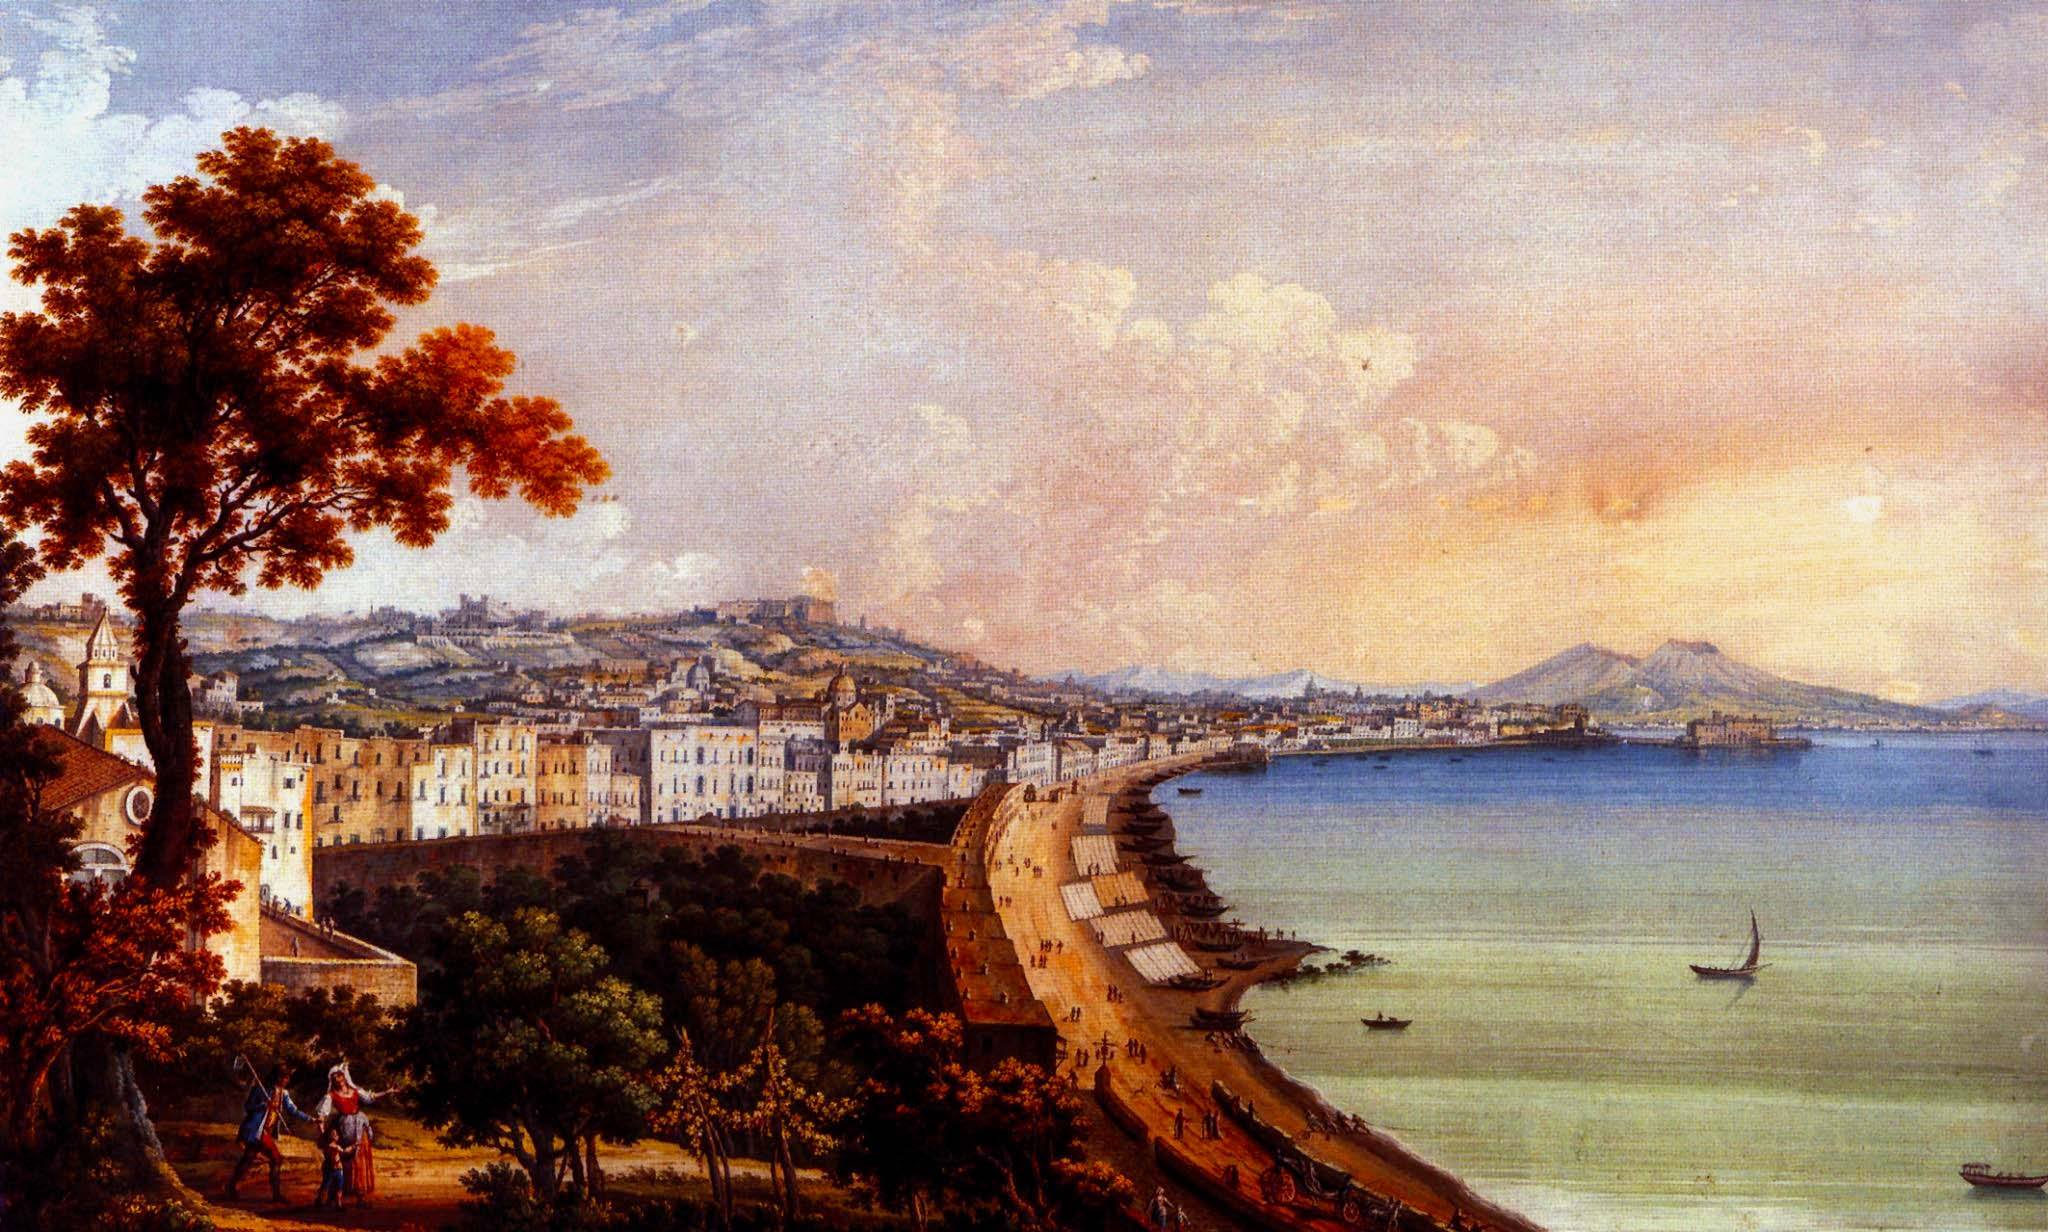 Poesie su Napoli